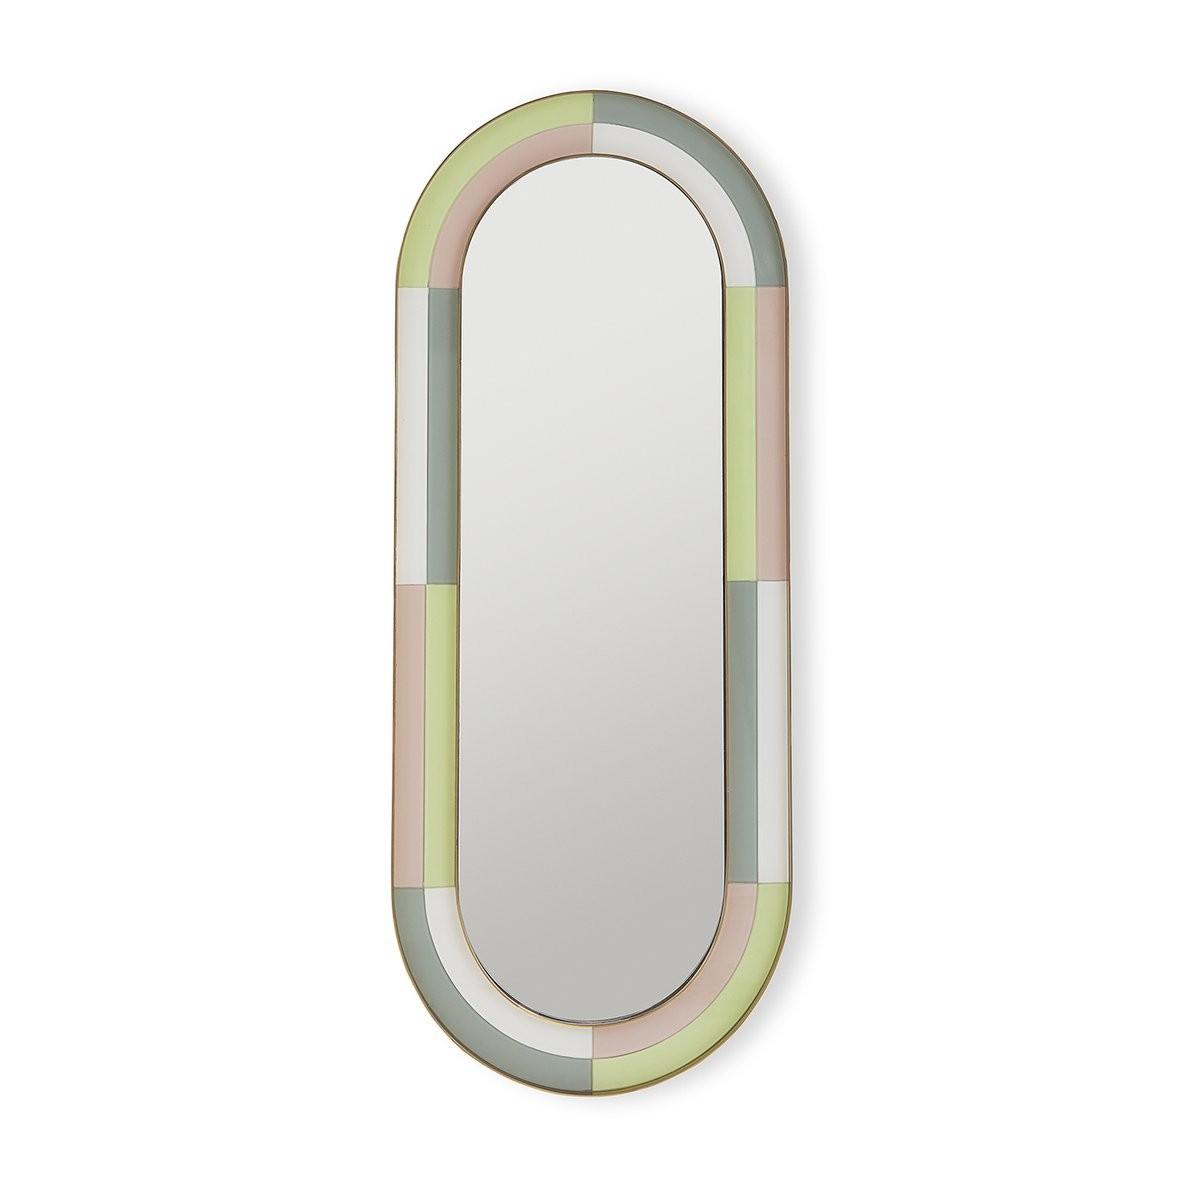 Jonathan Adler I Harlequin Capsule Mirror